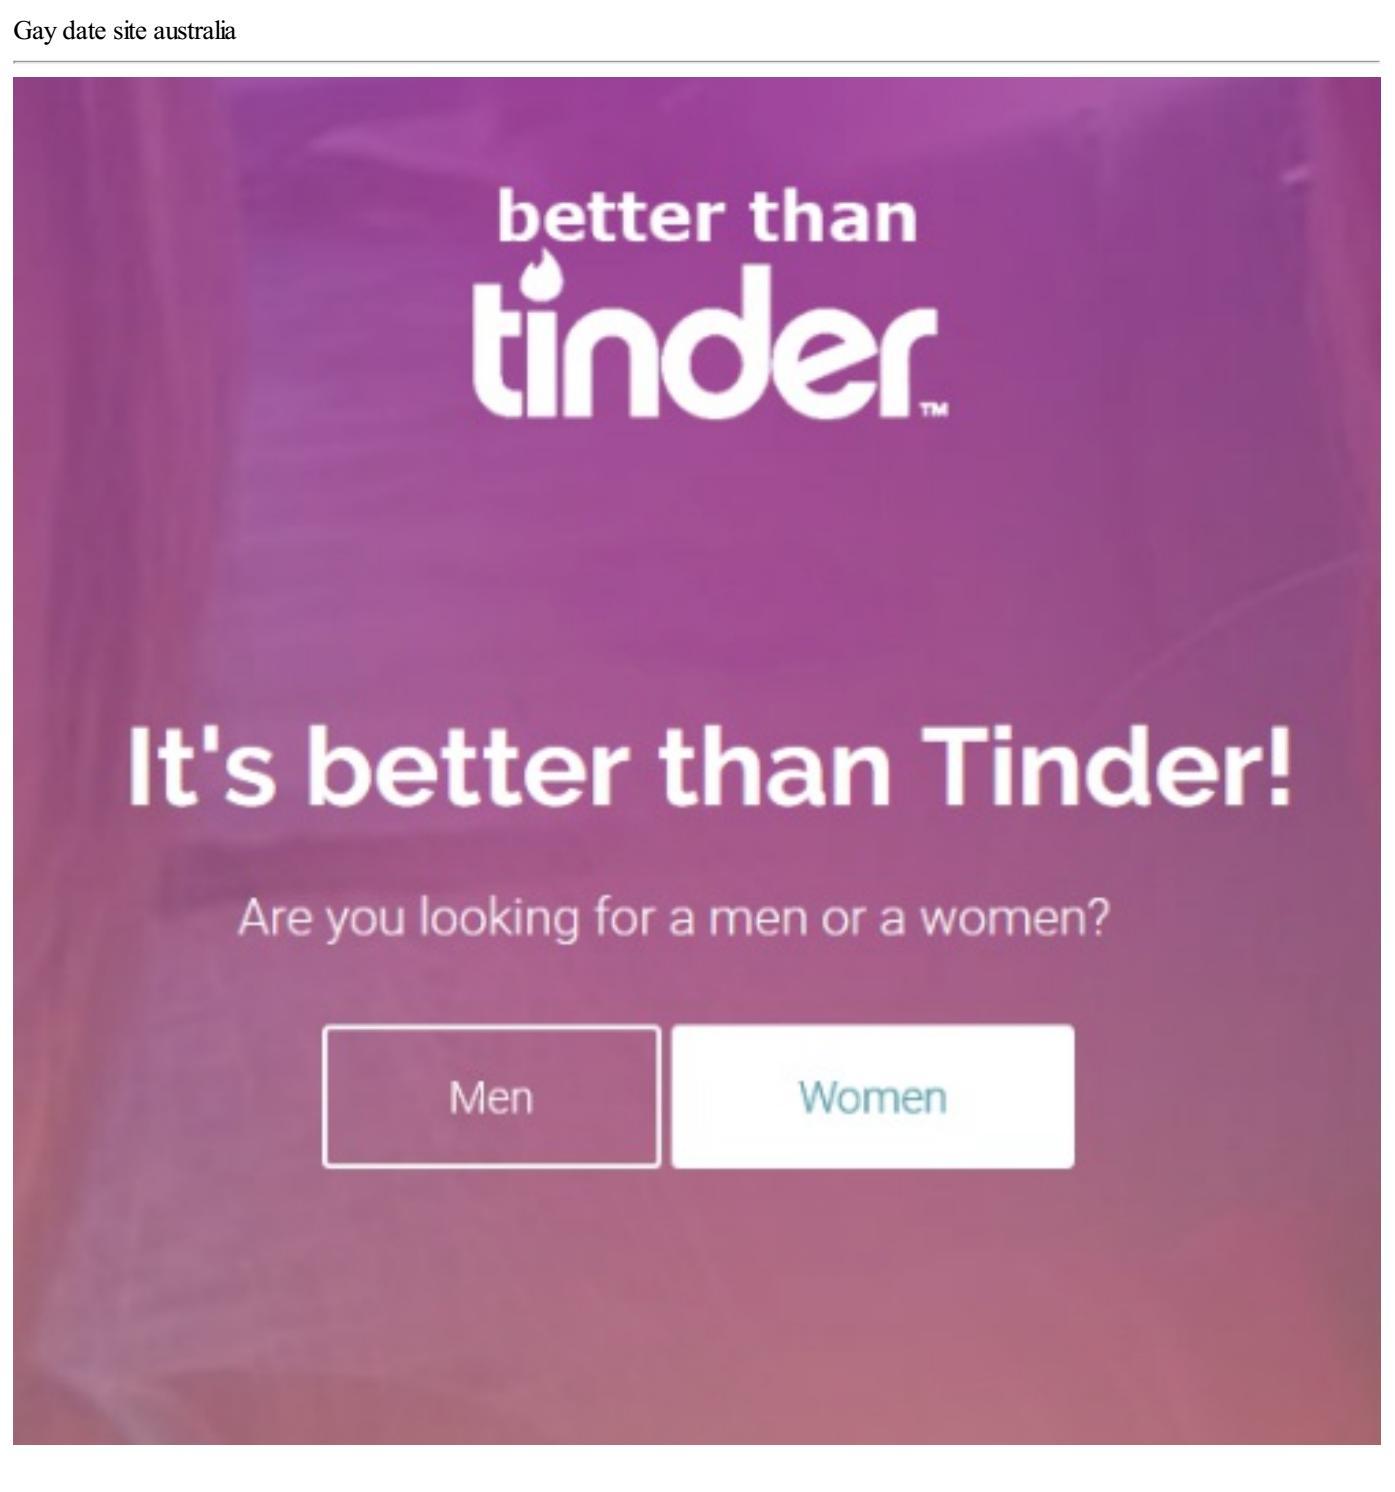 Gay dating site australia